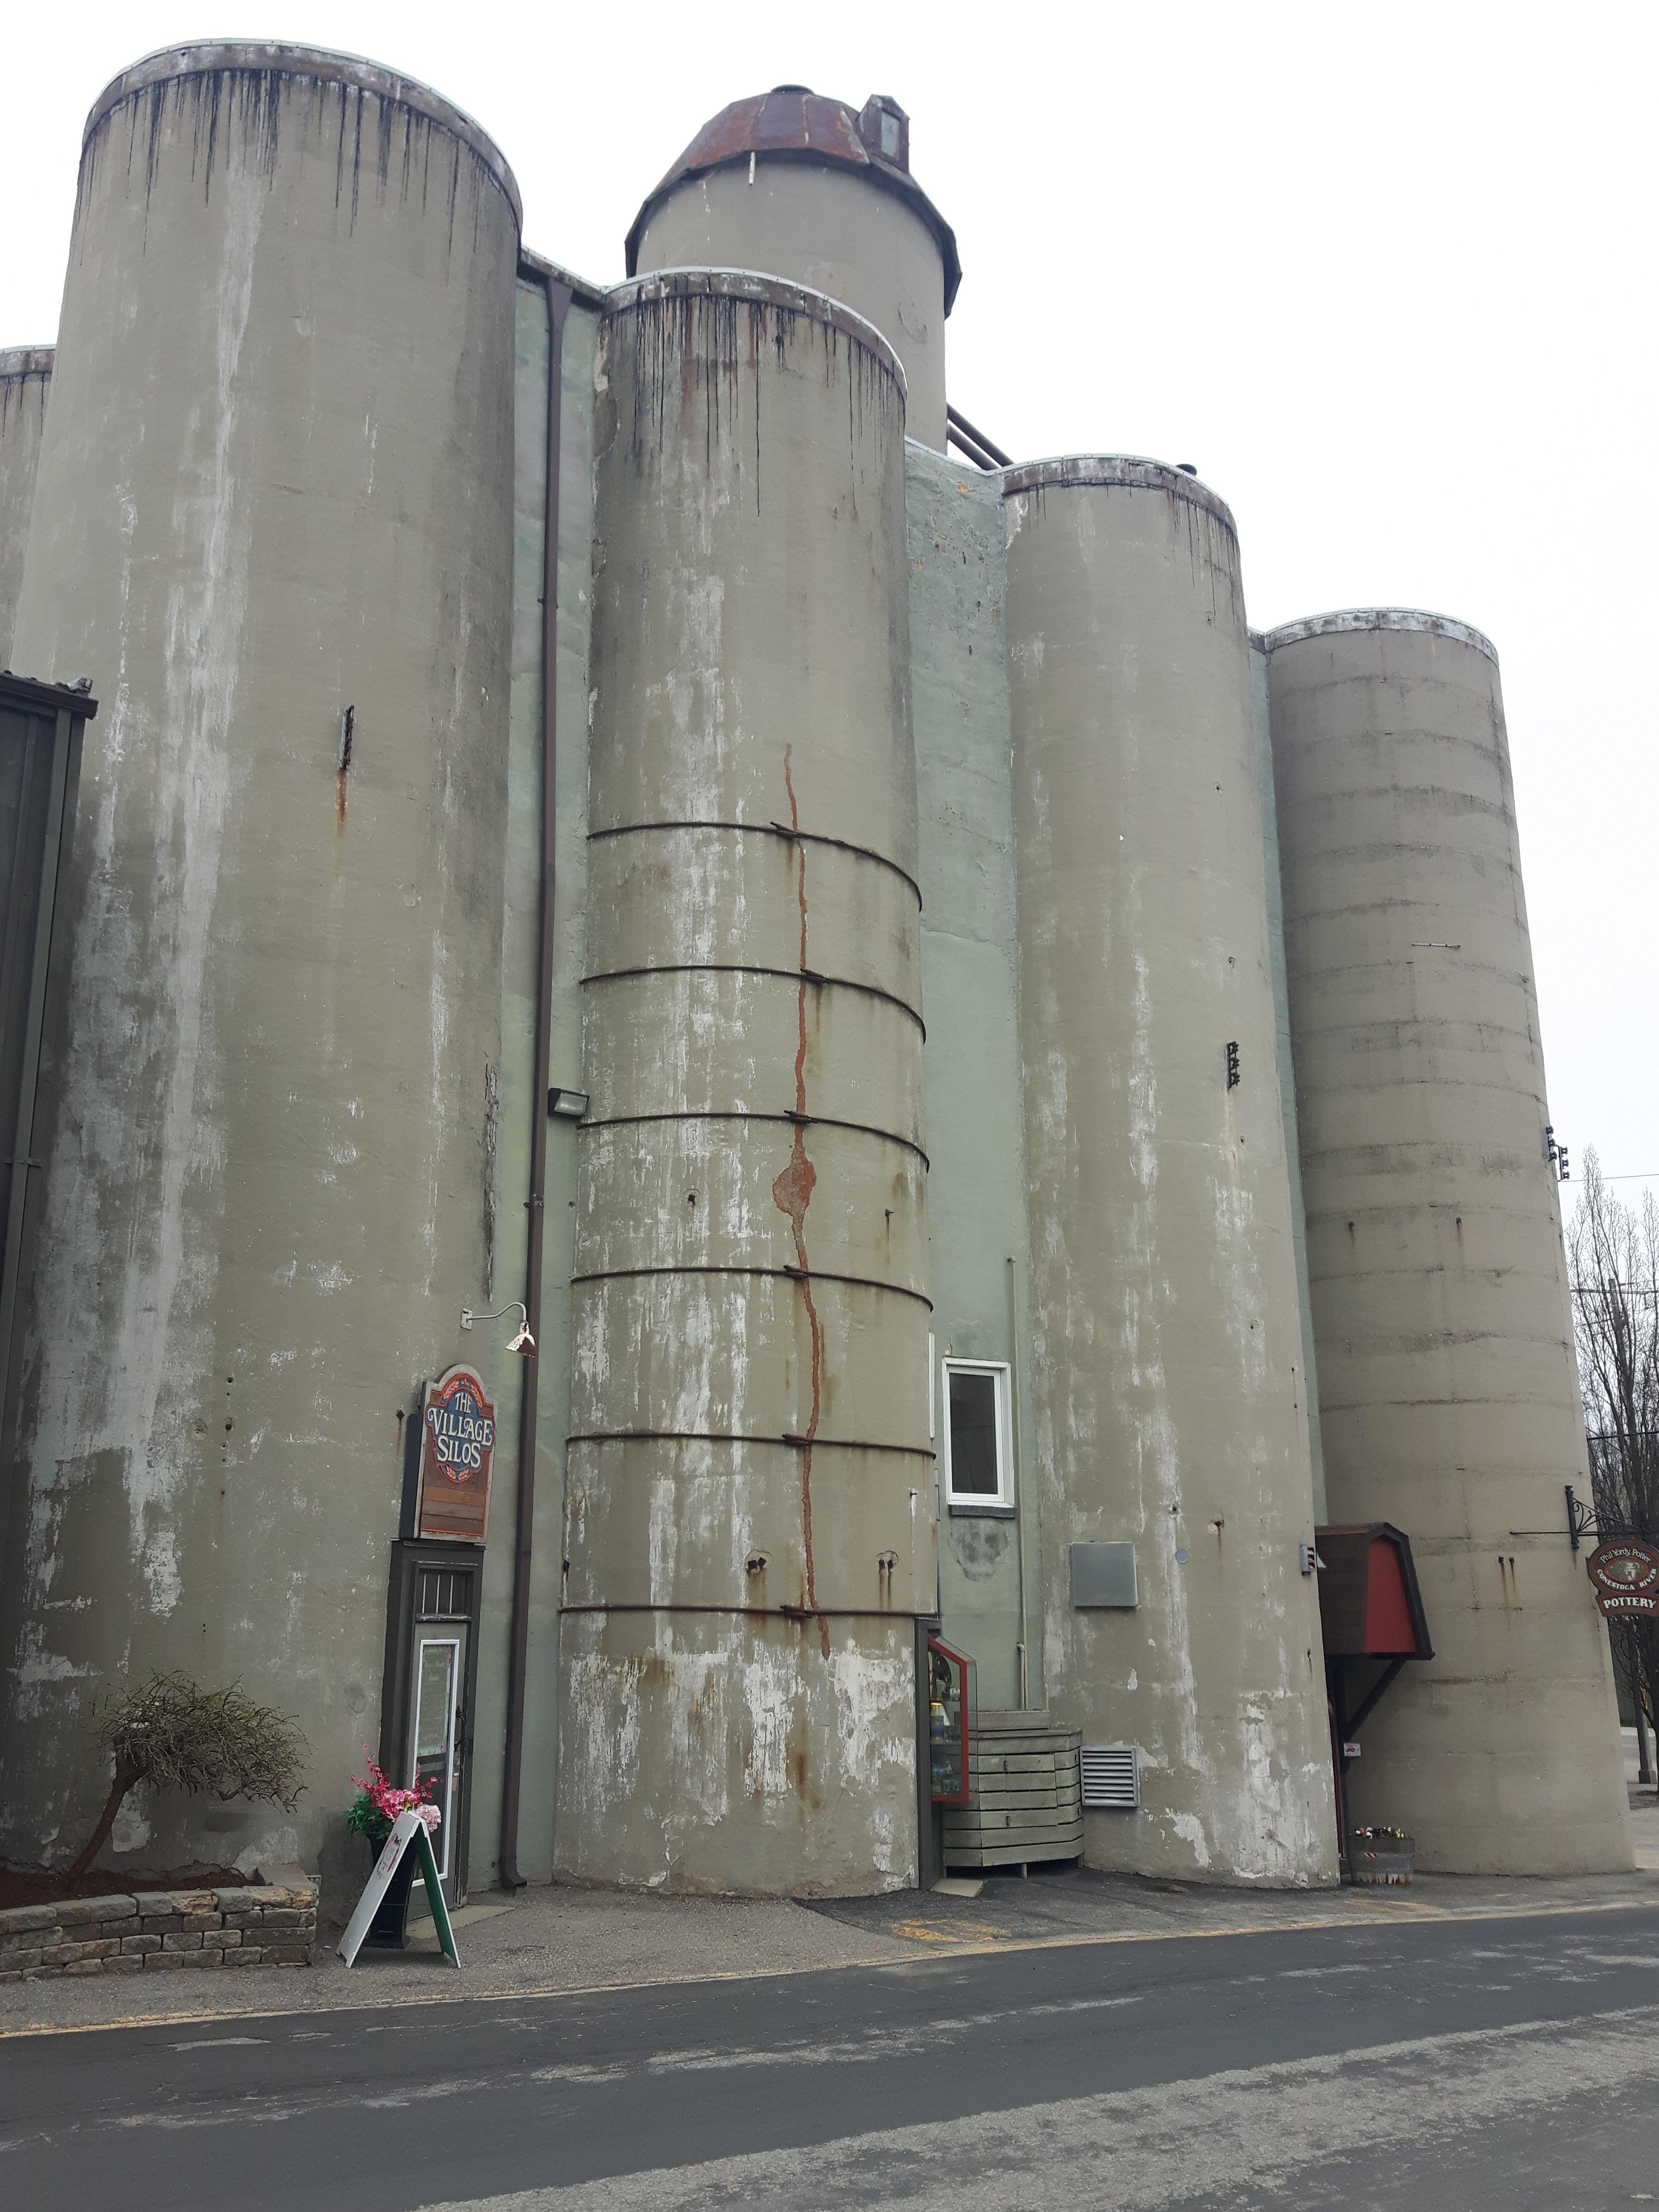 st-jacobs-silos-explore-shopping-in-st-jacobs-ontario